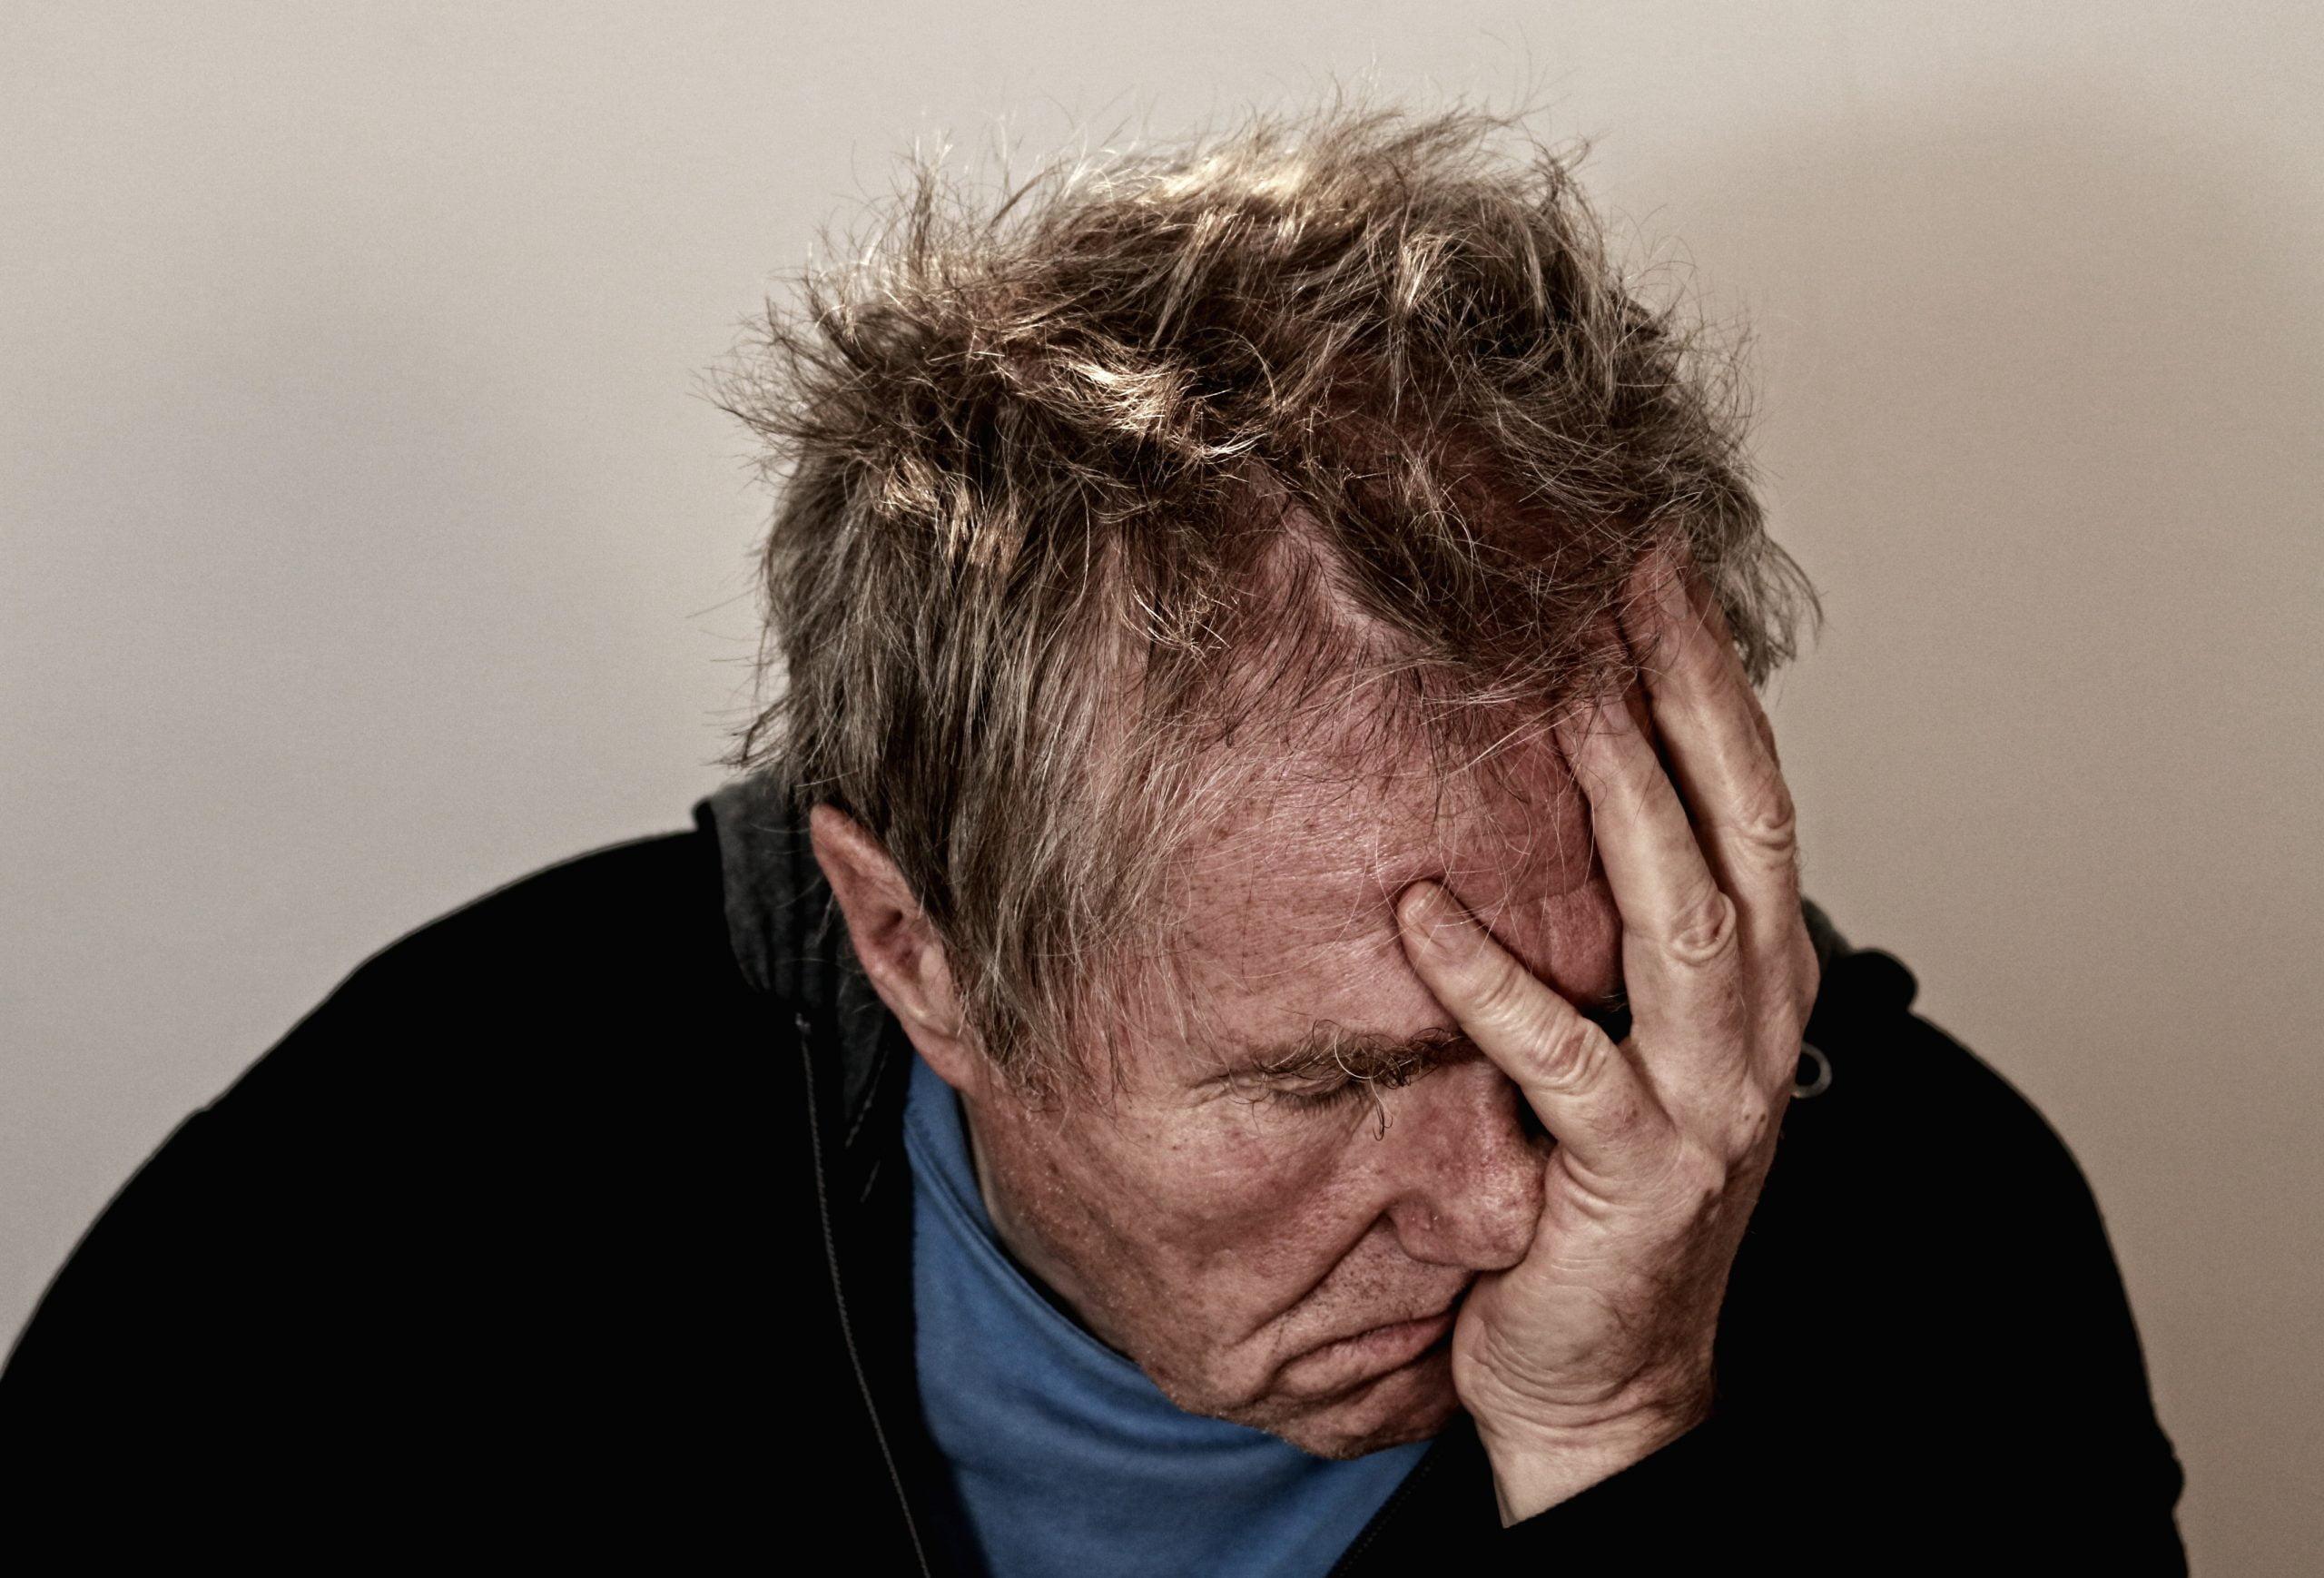 Headache (Migraines)